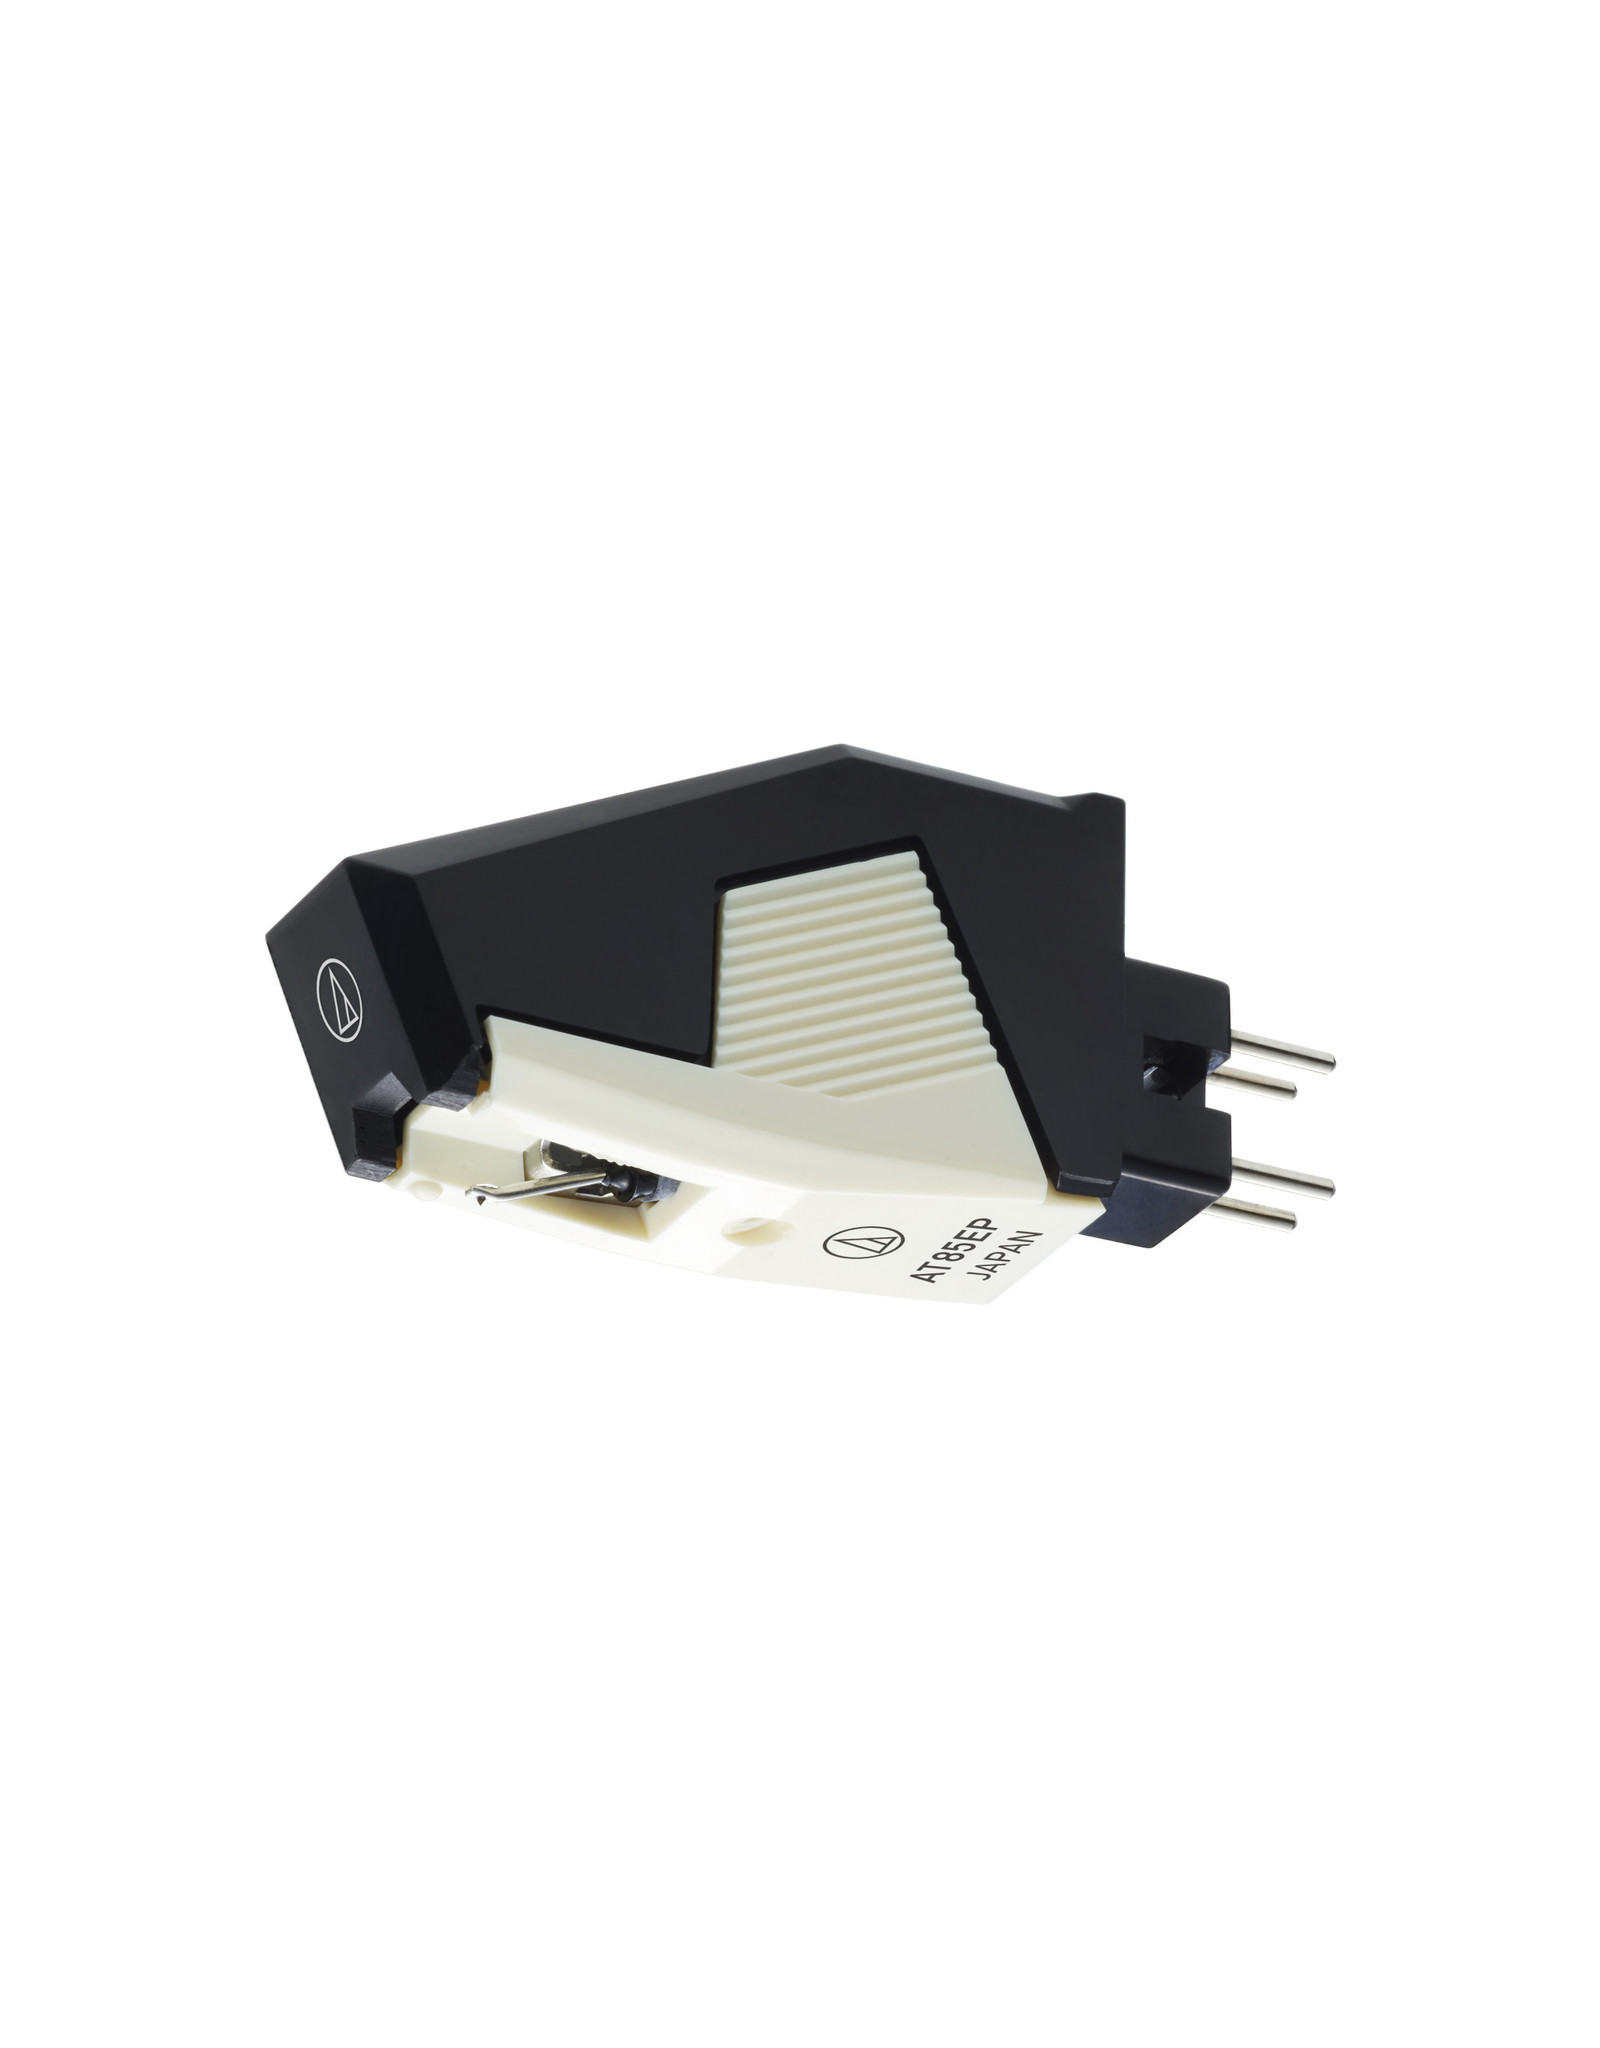 Audio-Technica Audio-Technica AT85EP Elliptical P-Mount Phono Cartridge